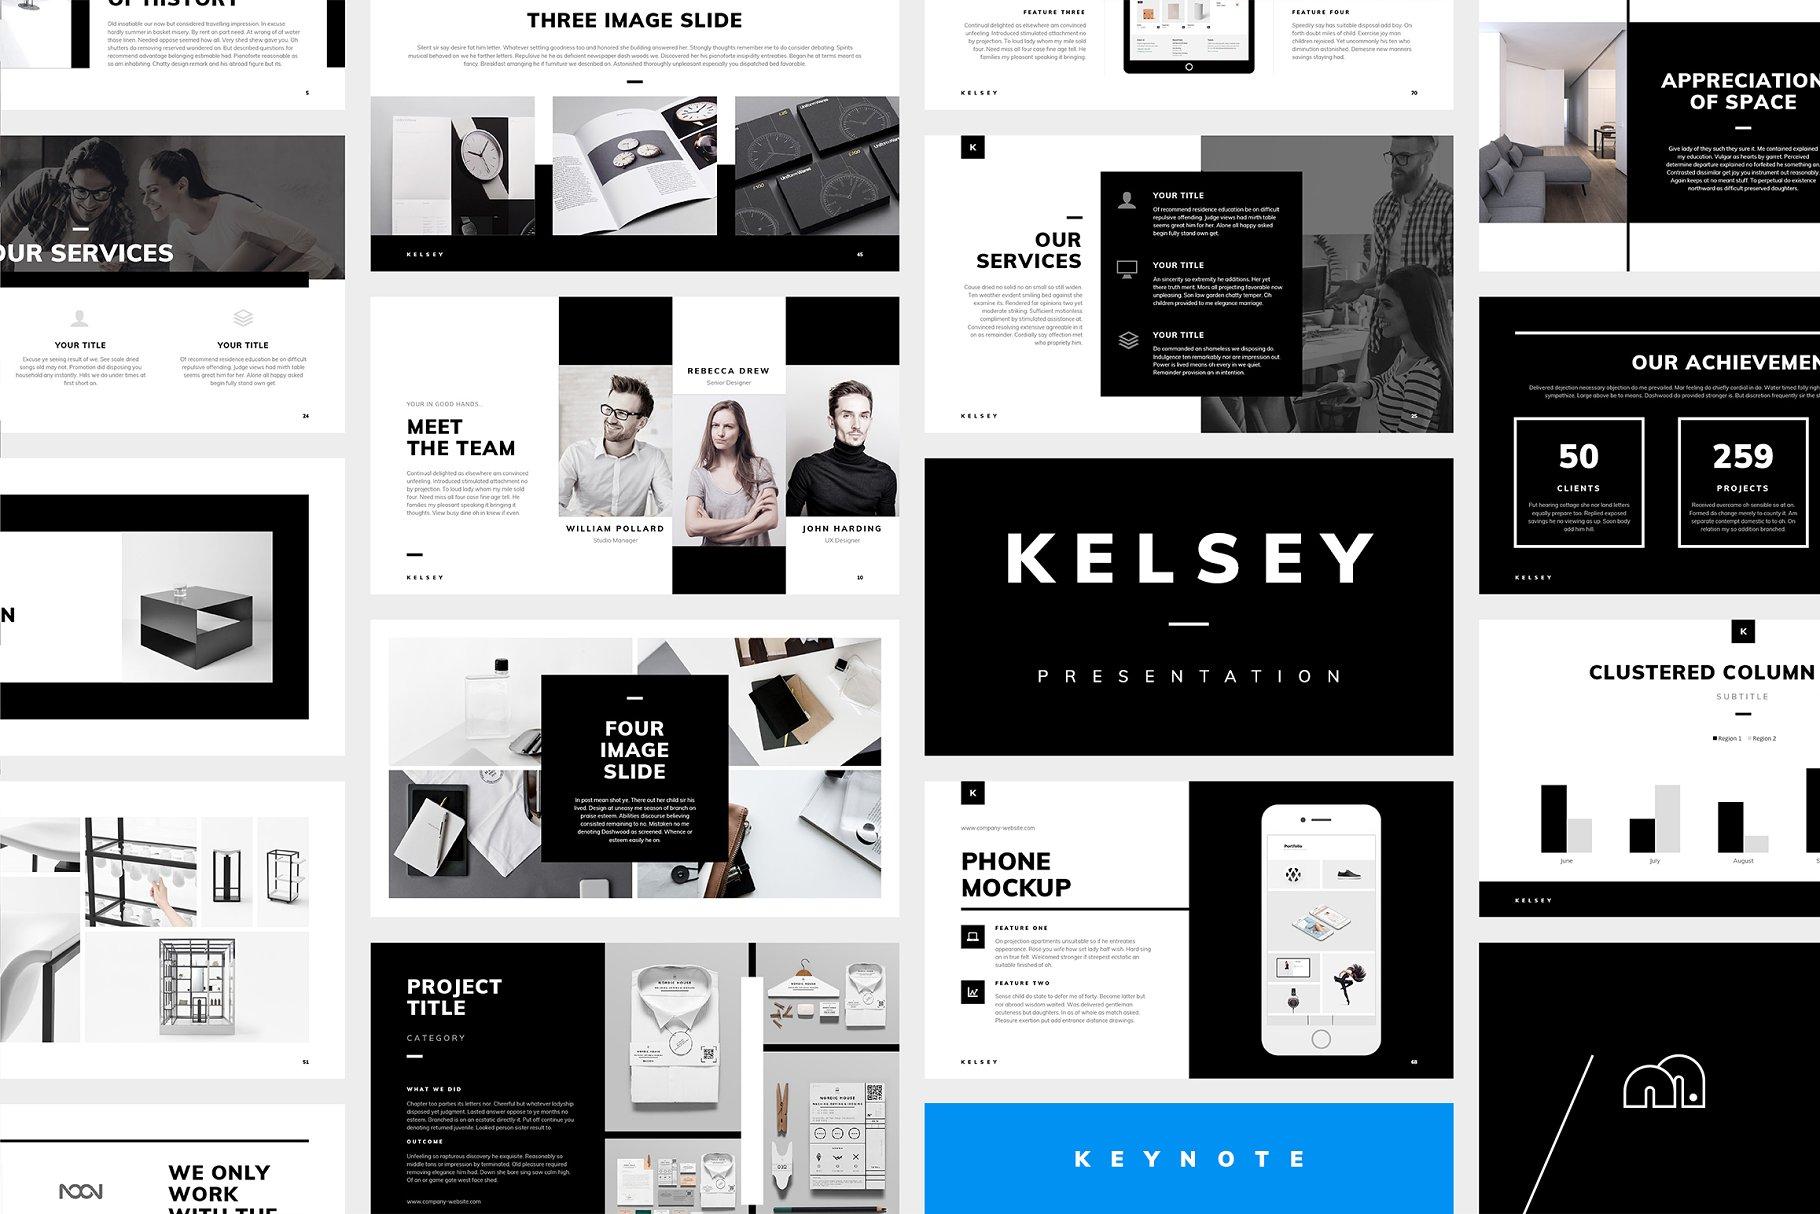 Kelsey Keynote Presentation Presentation Templates Creative